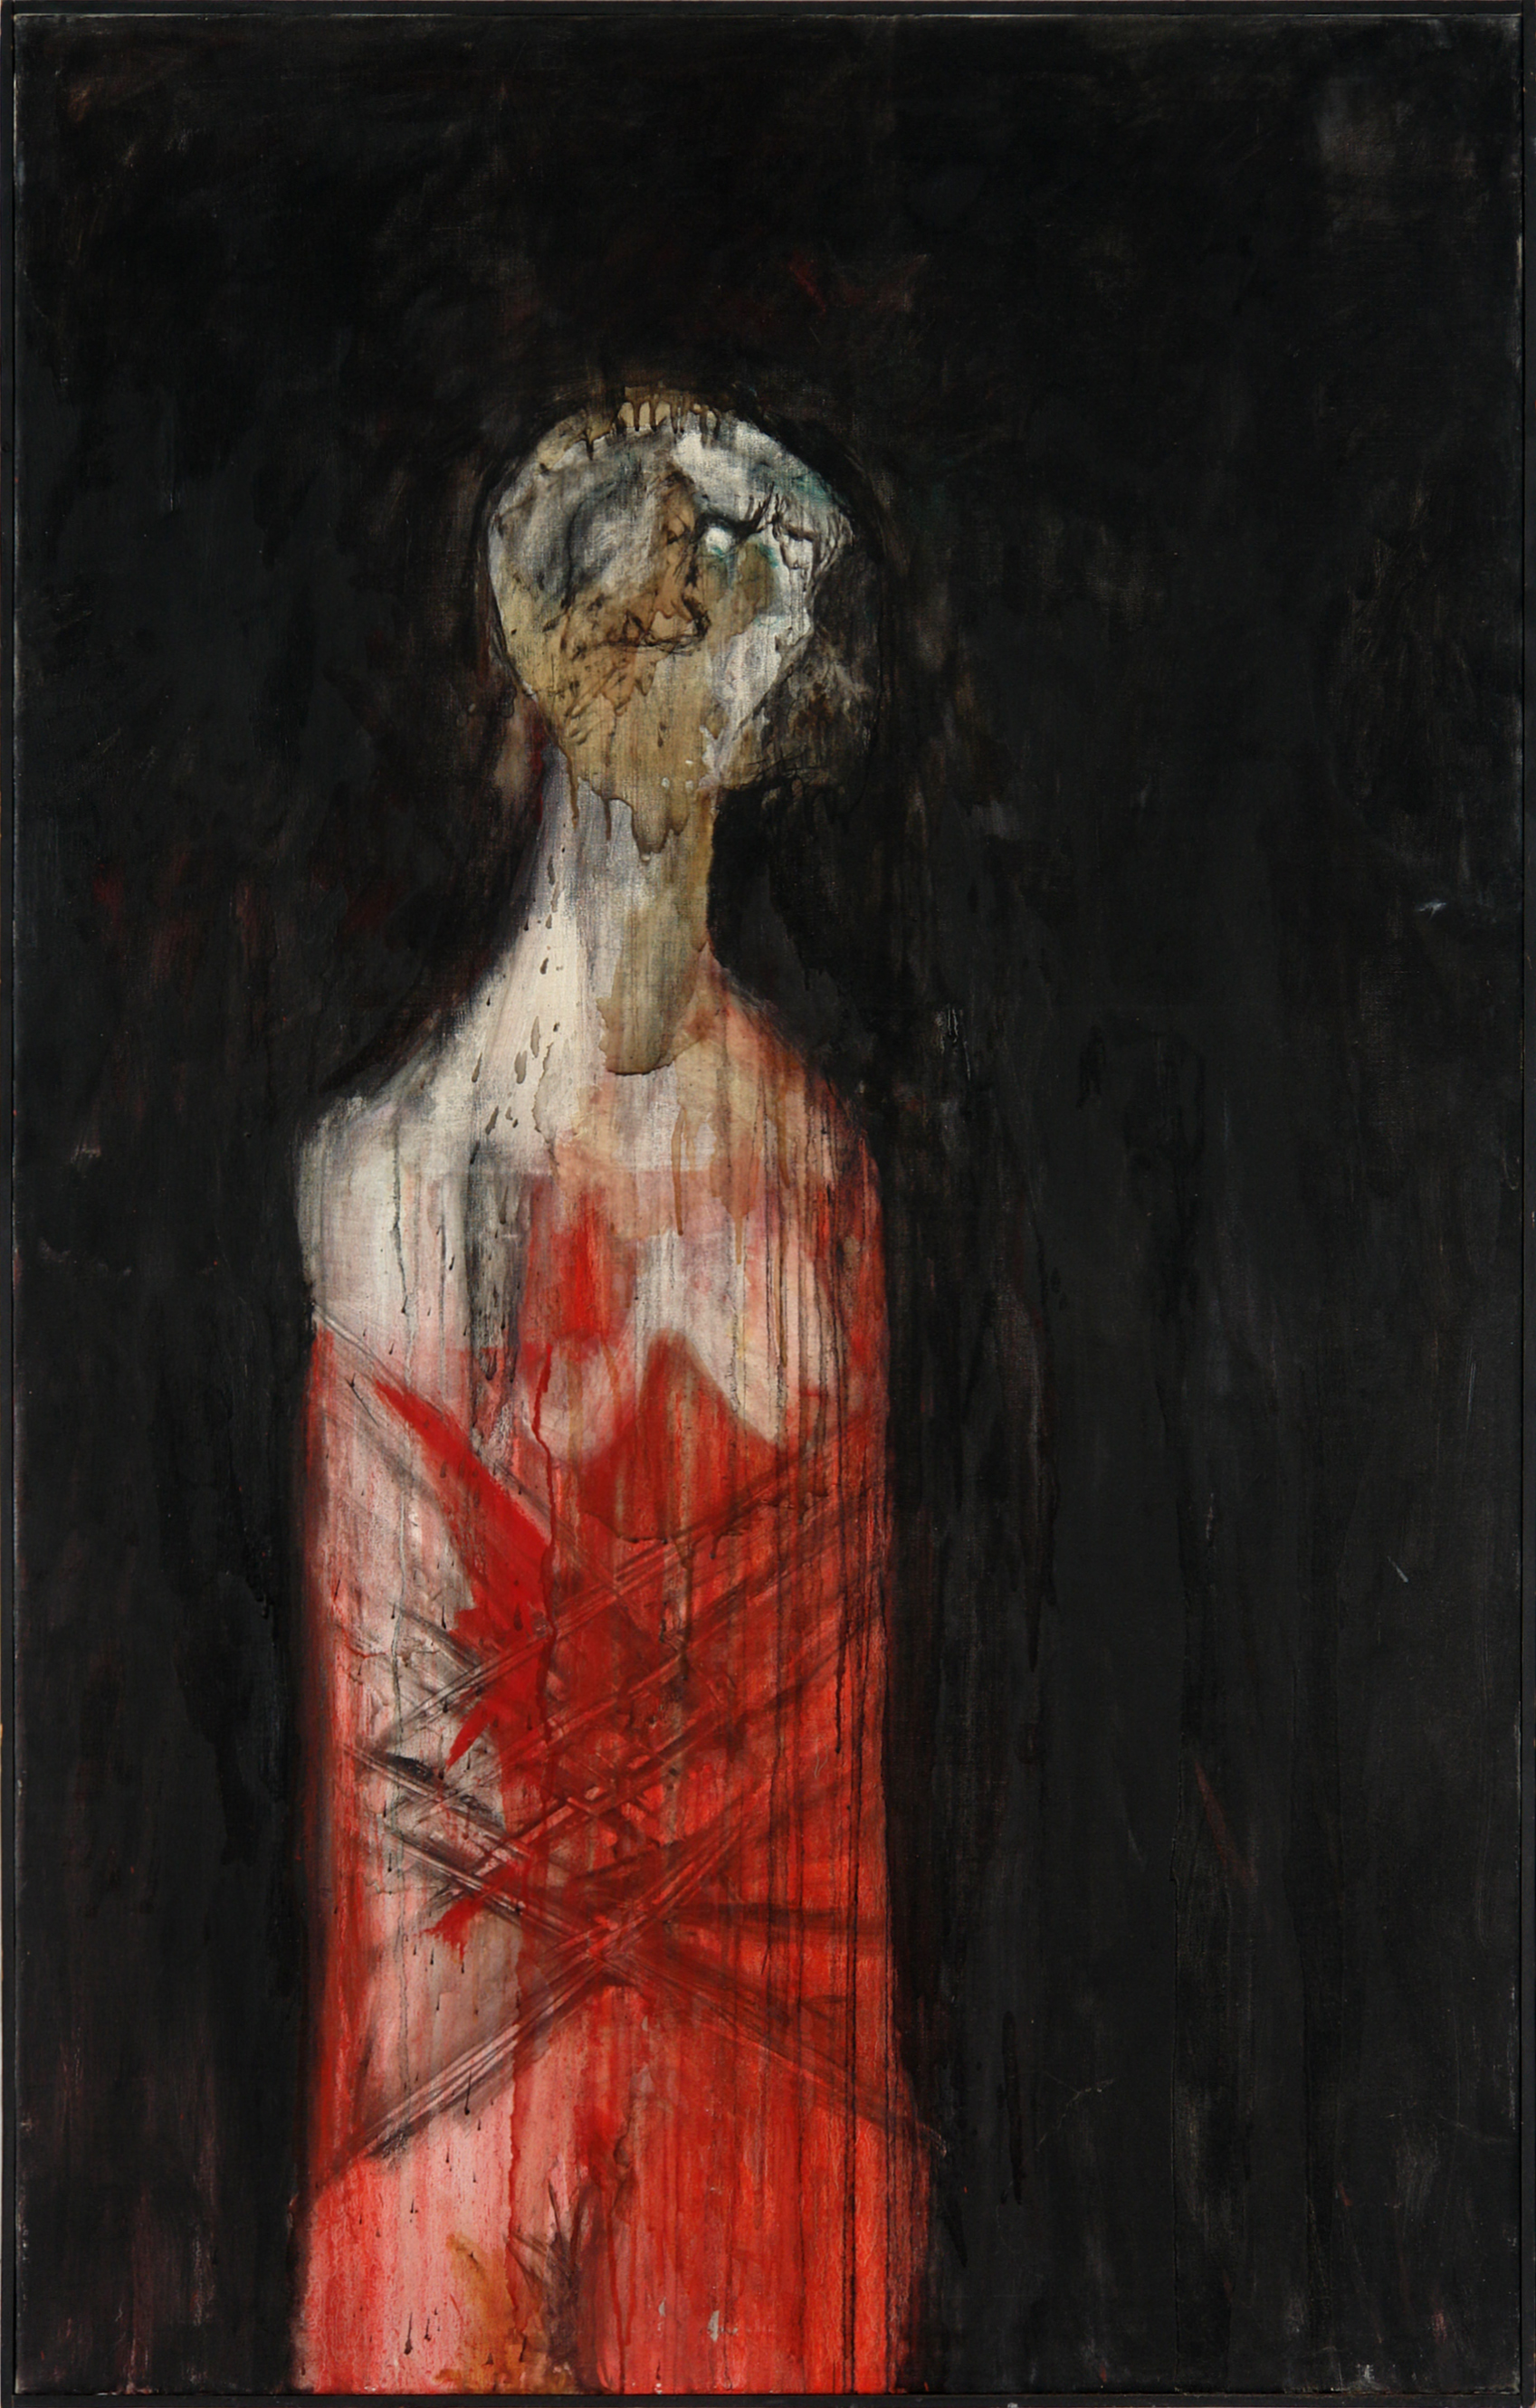 George Lampe - Aveugle et Prise Dans un Camisole de Force (Blind and Taken in a Straight Jacket) - GL48